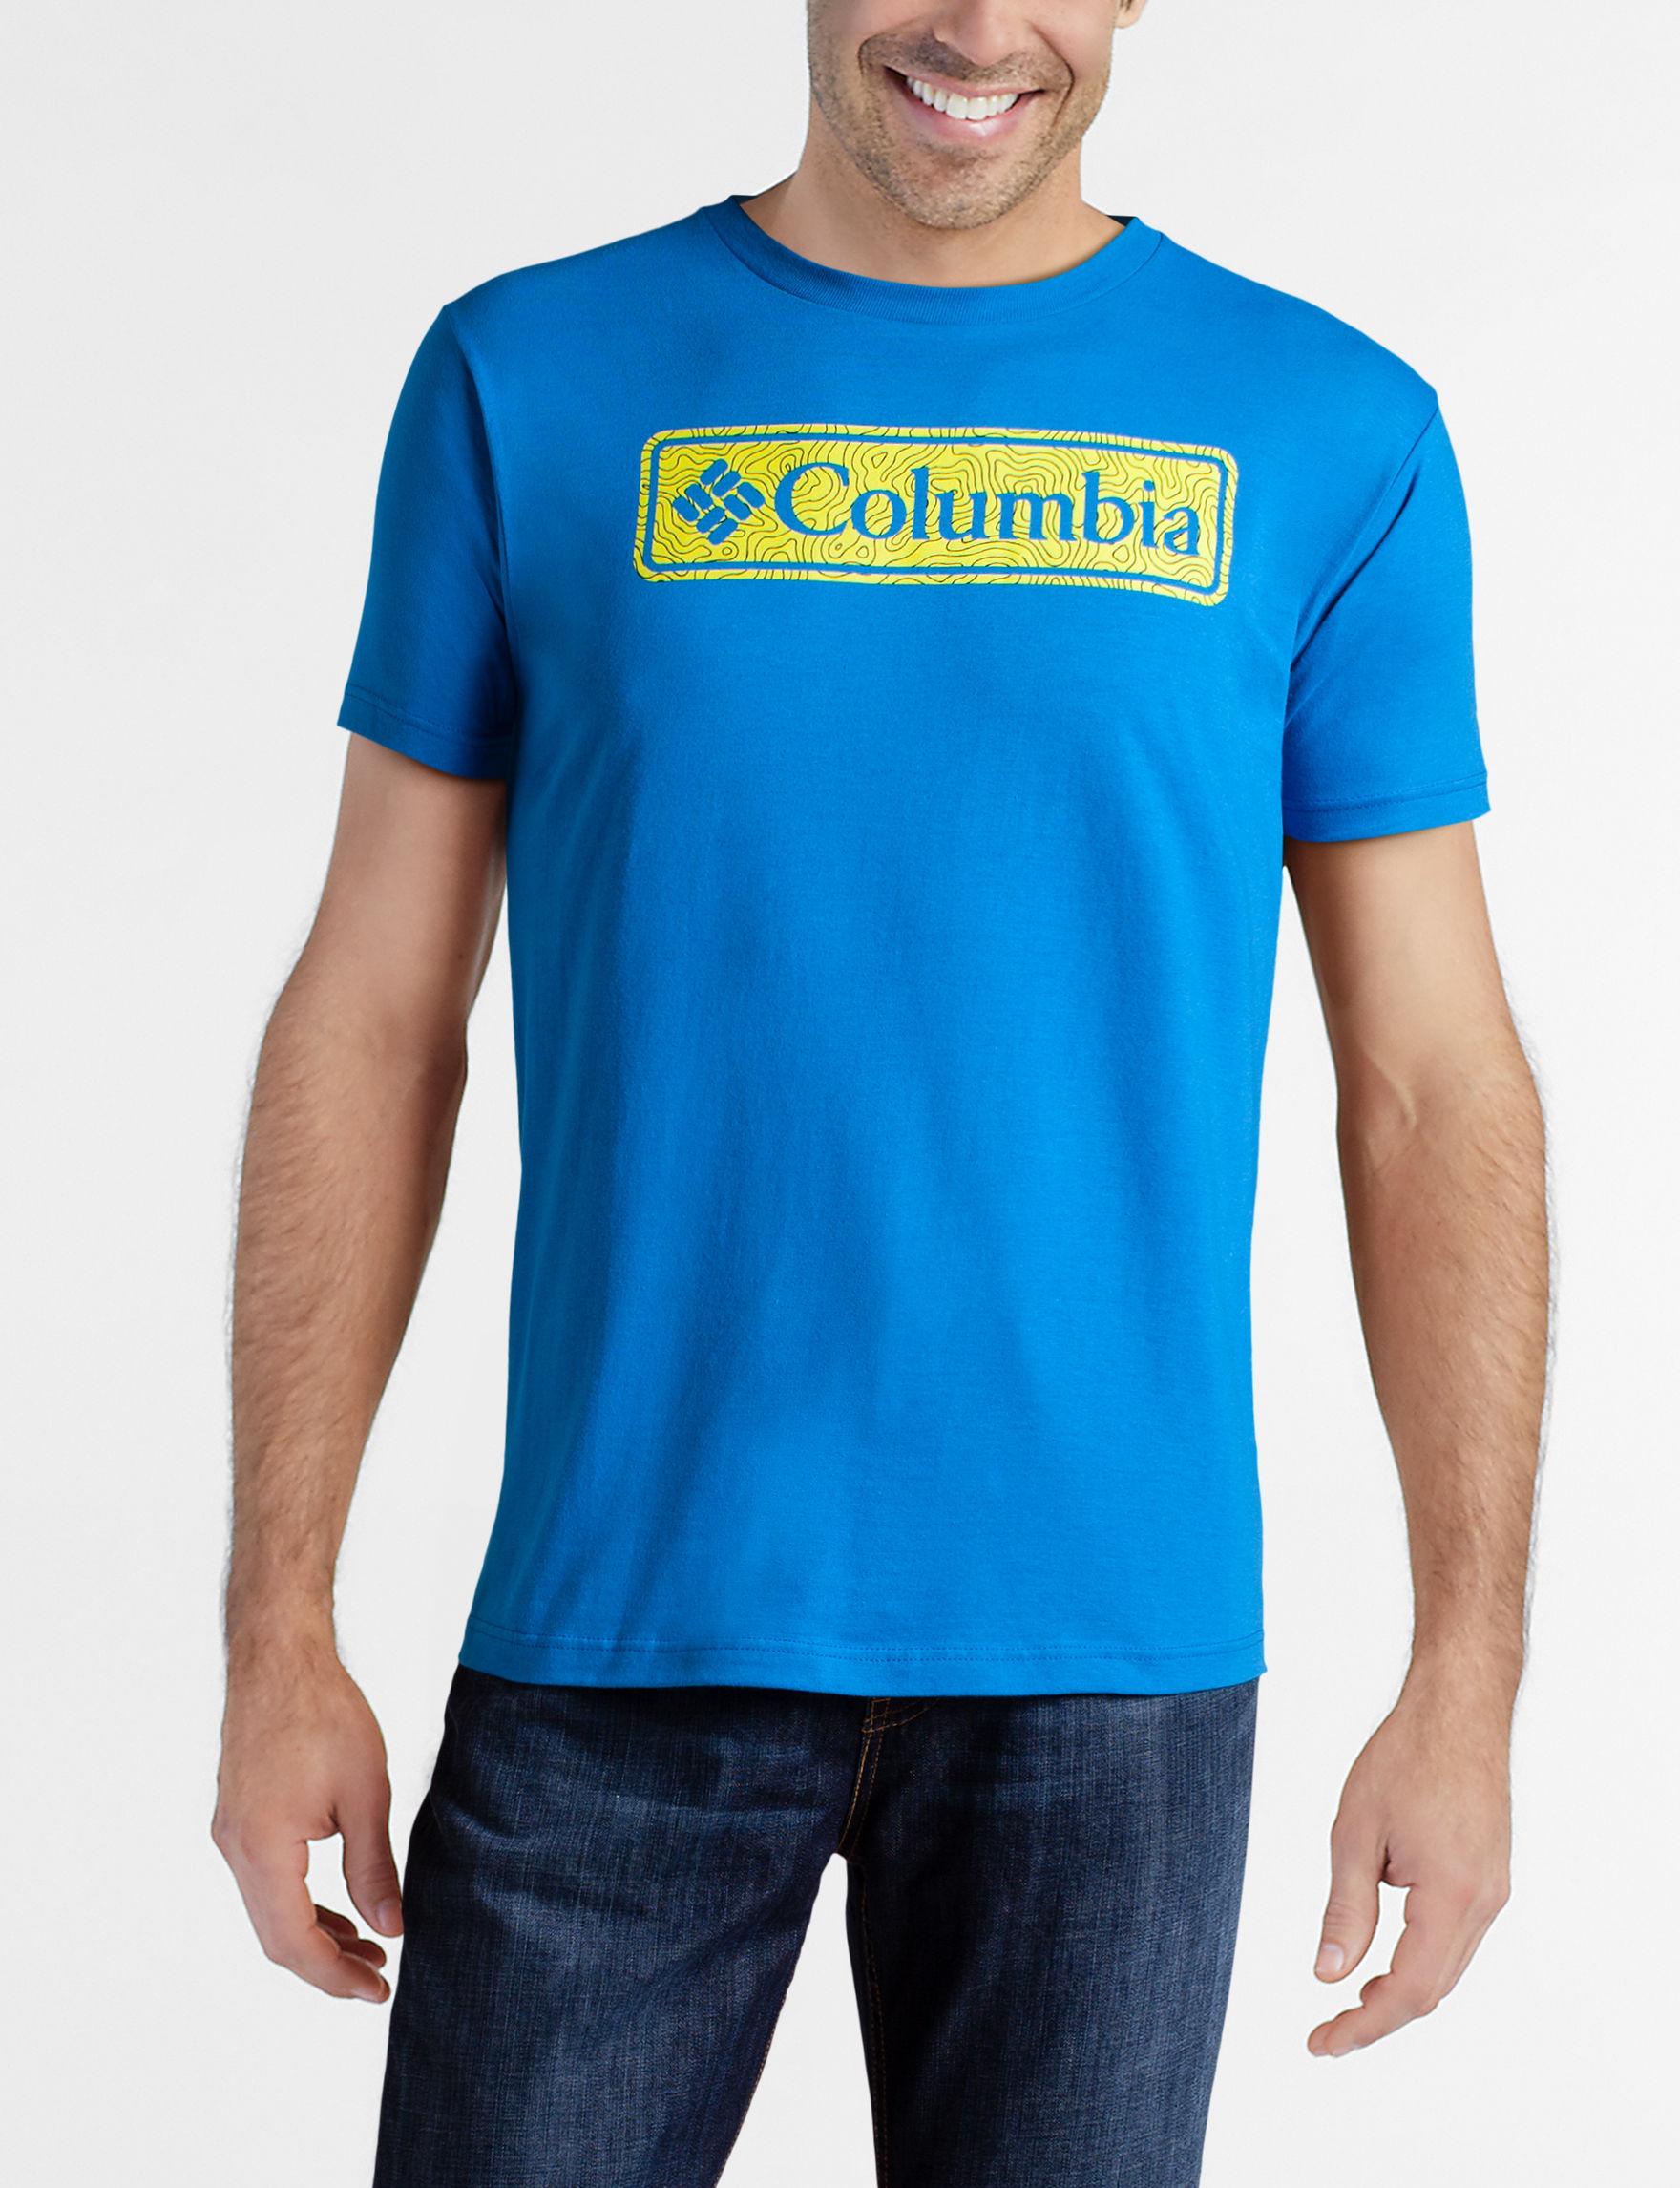 Columbia Hyper Blue Tees & Tanks